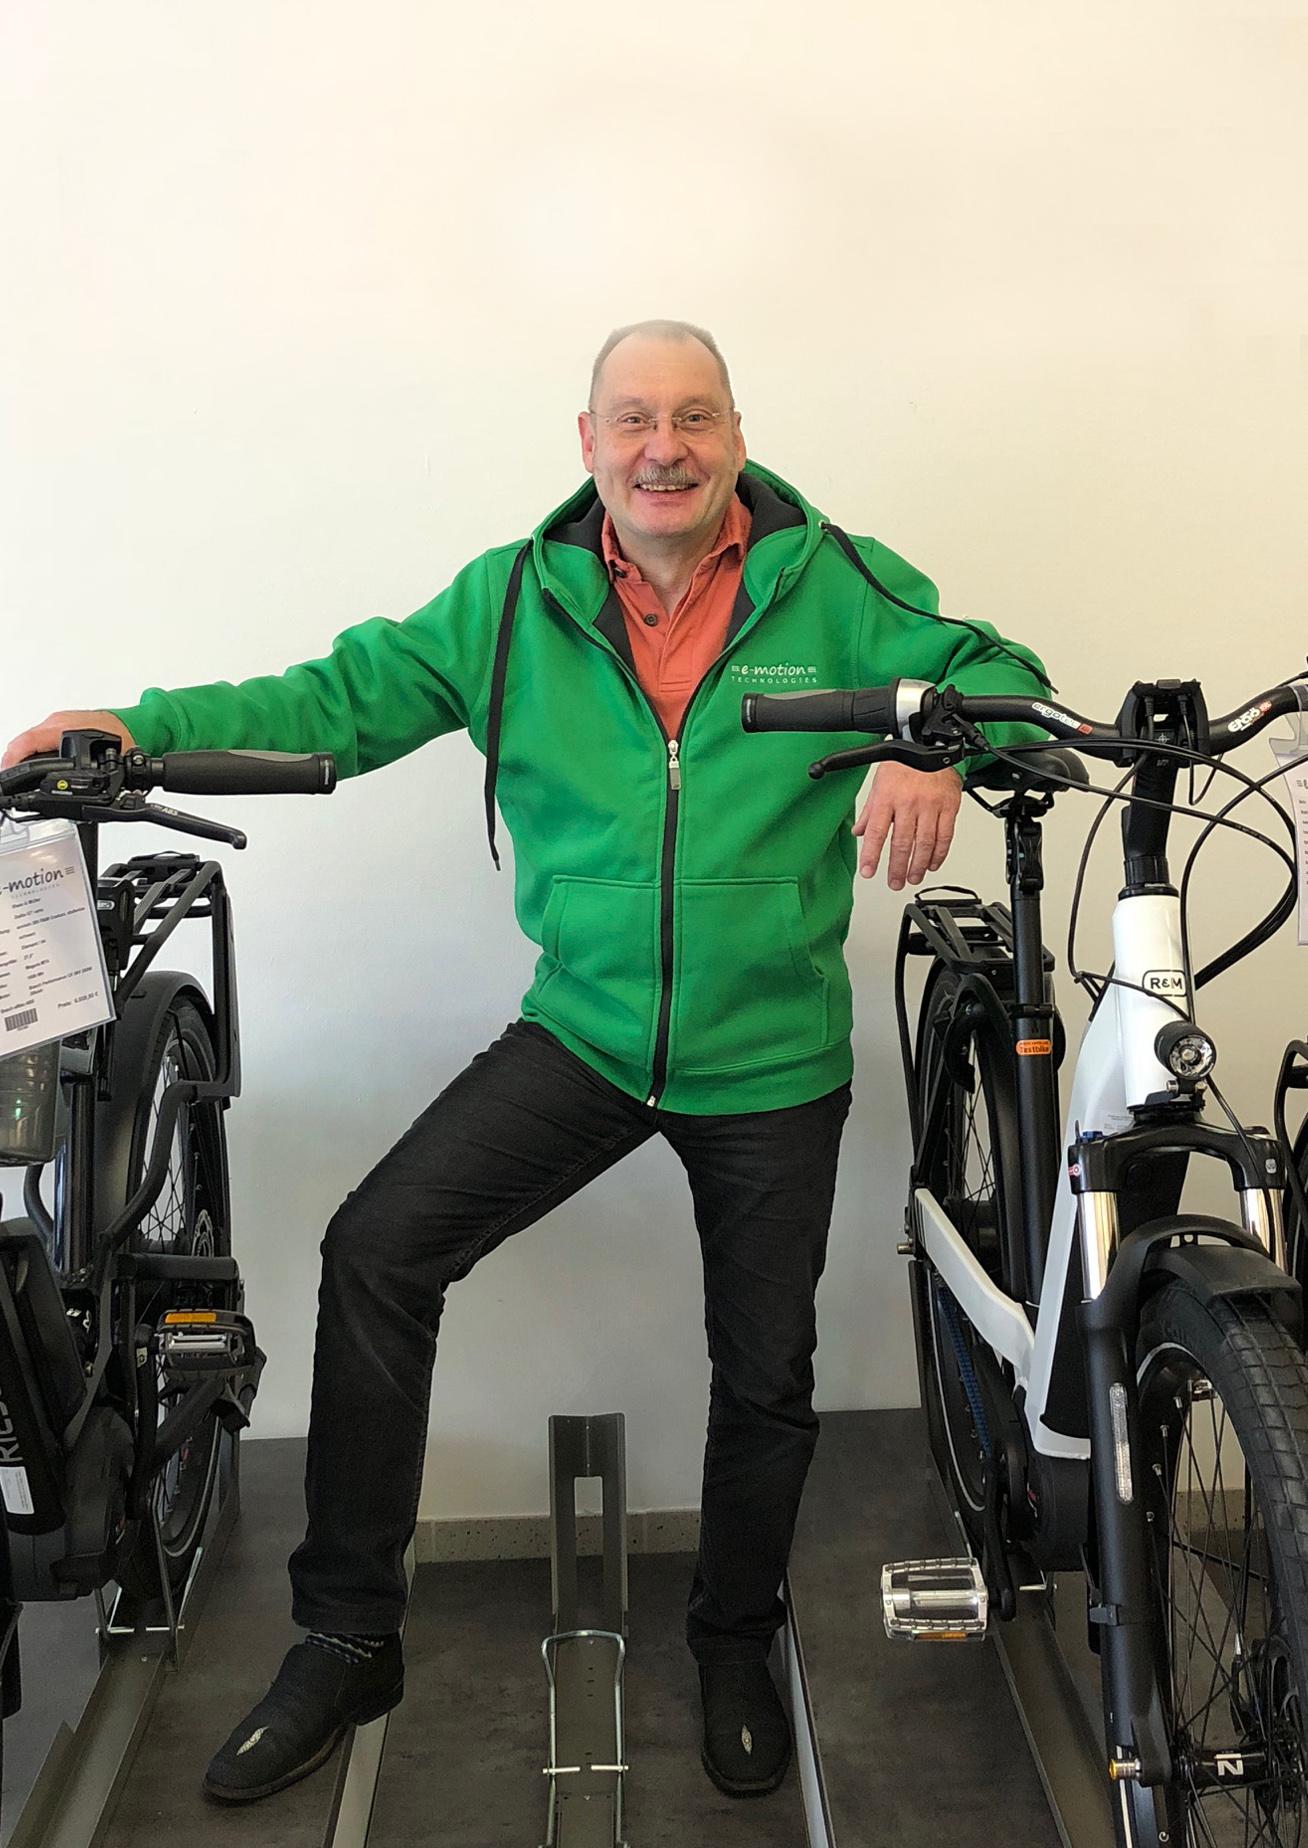 e-motion e-Bike Experte Christoph Daim in Wien, Österreich